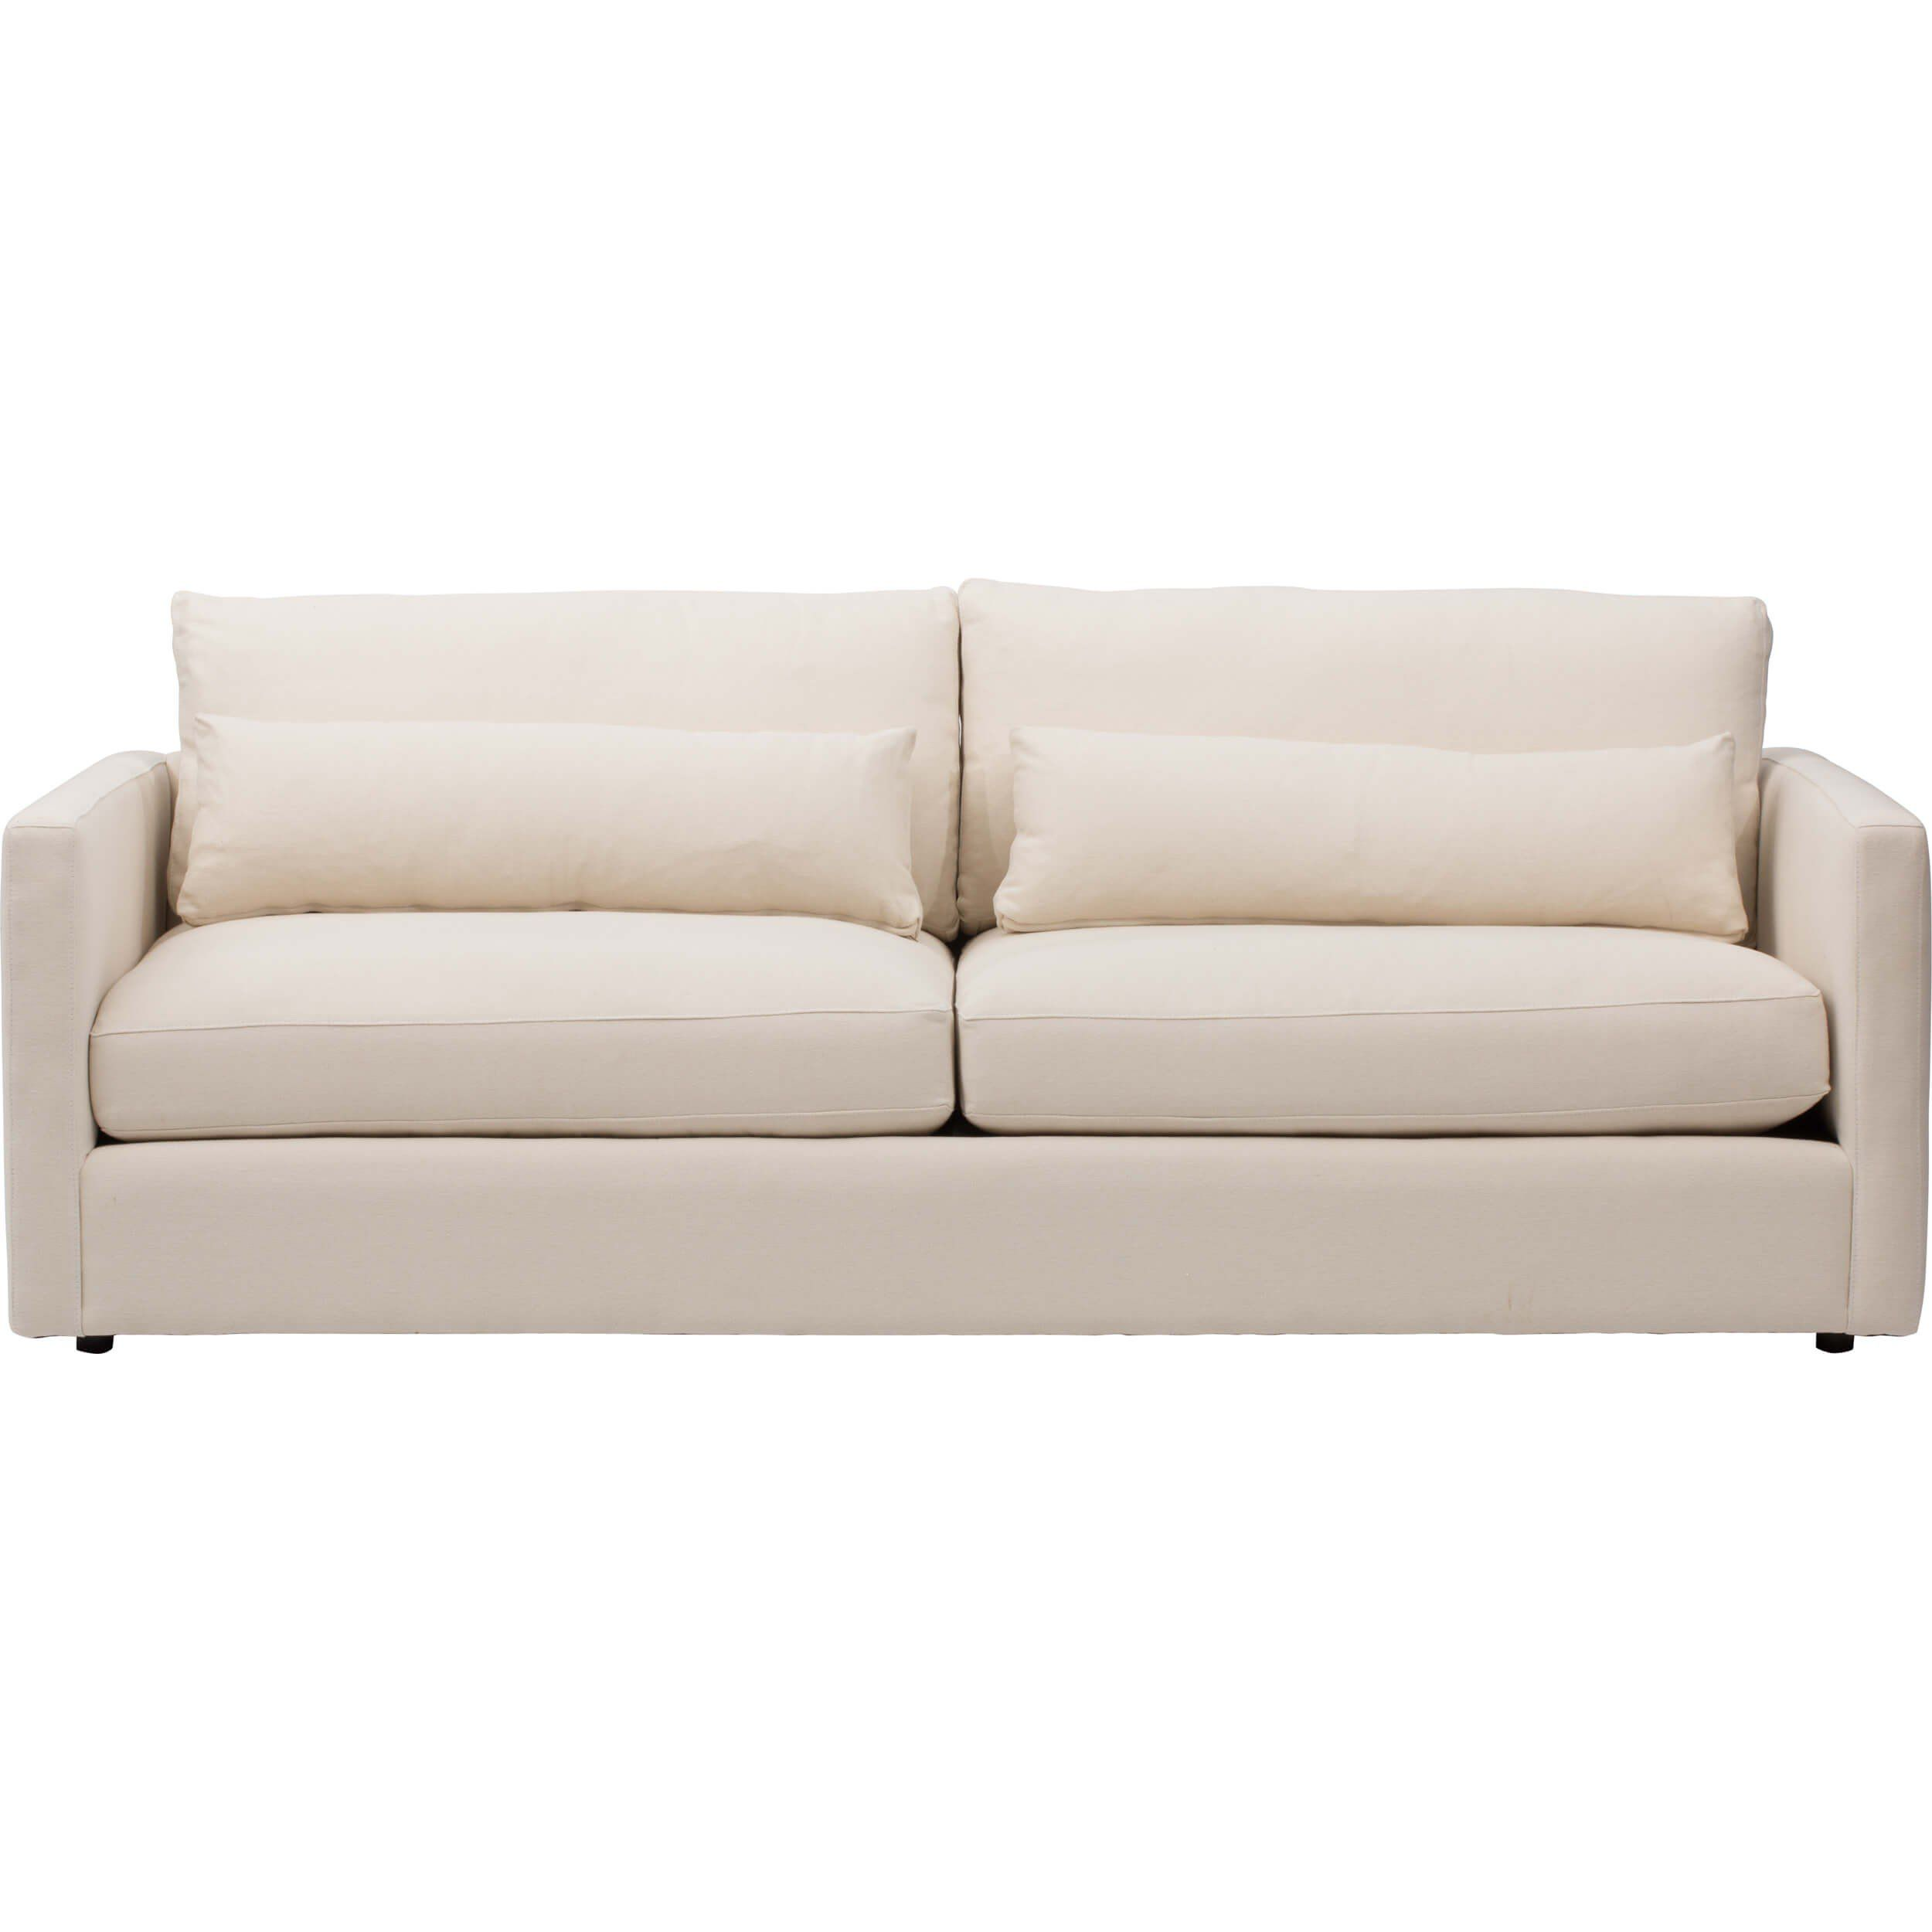 kennedy sofa dreamy ivory  sofa family room sofa furniture